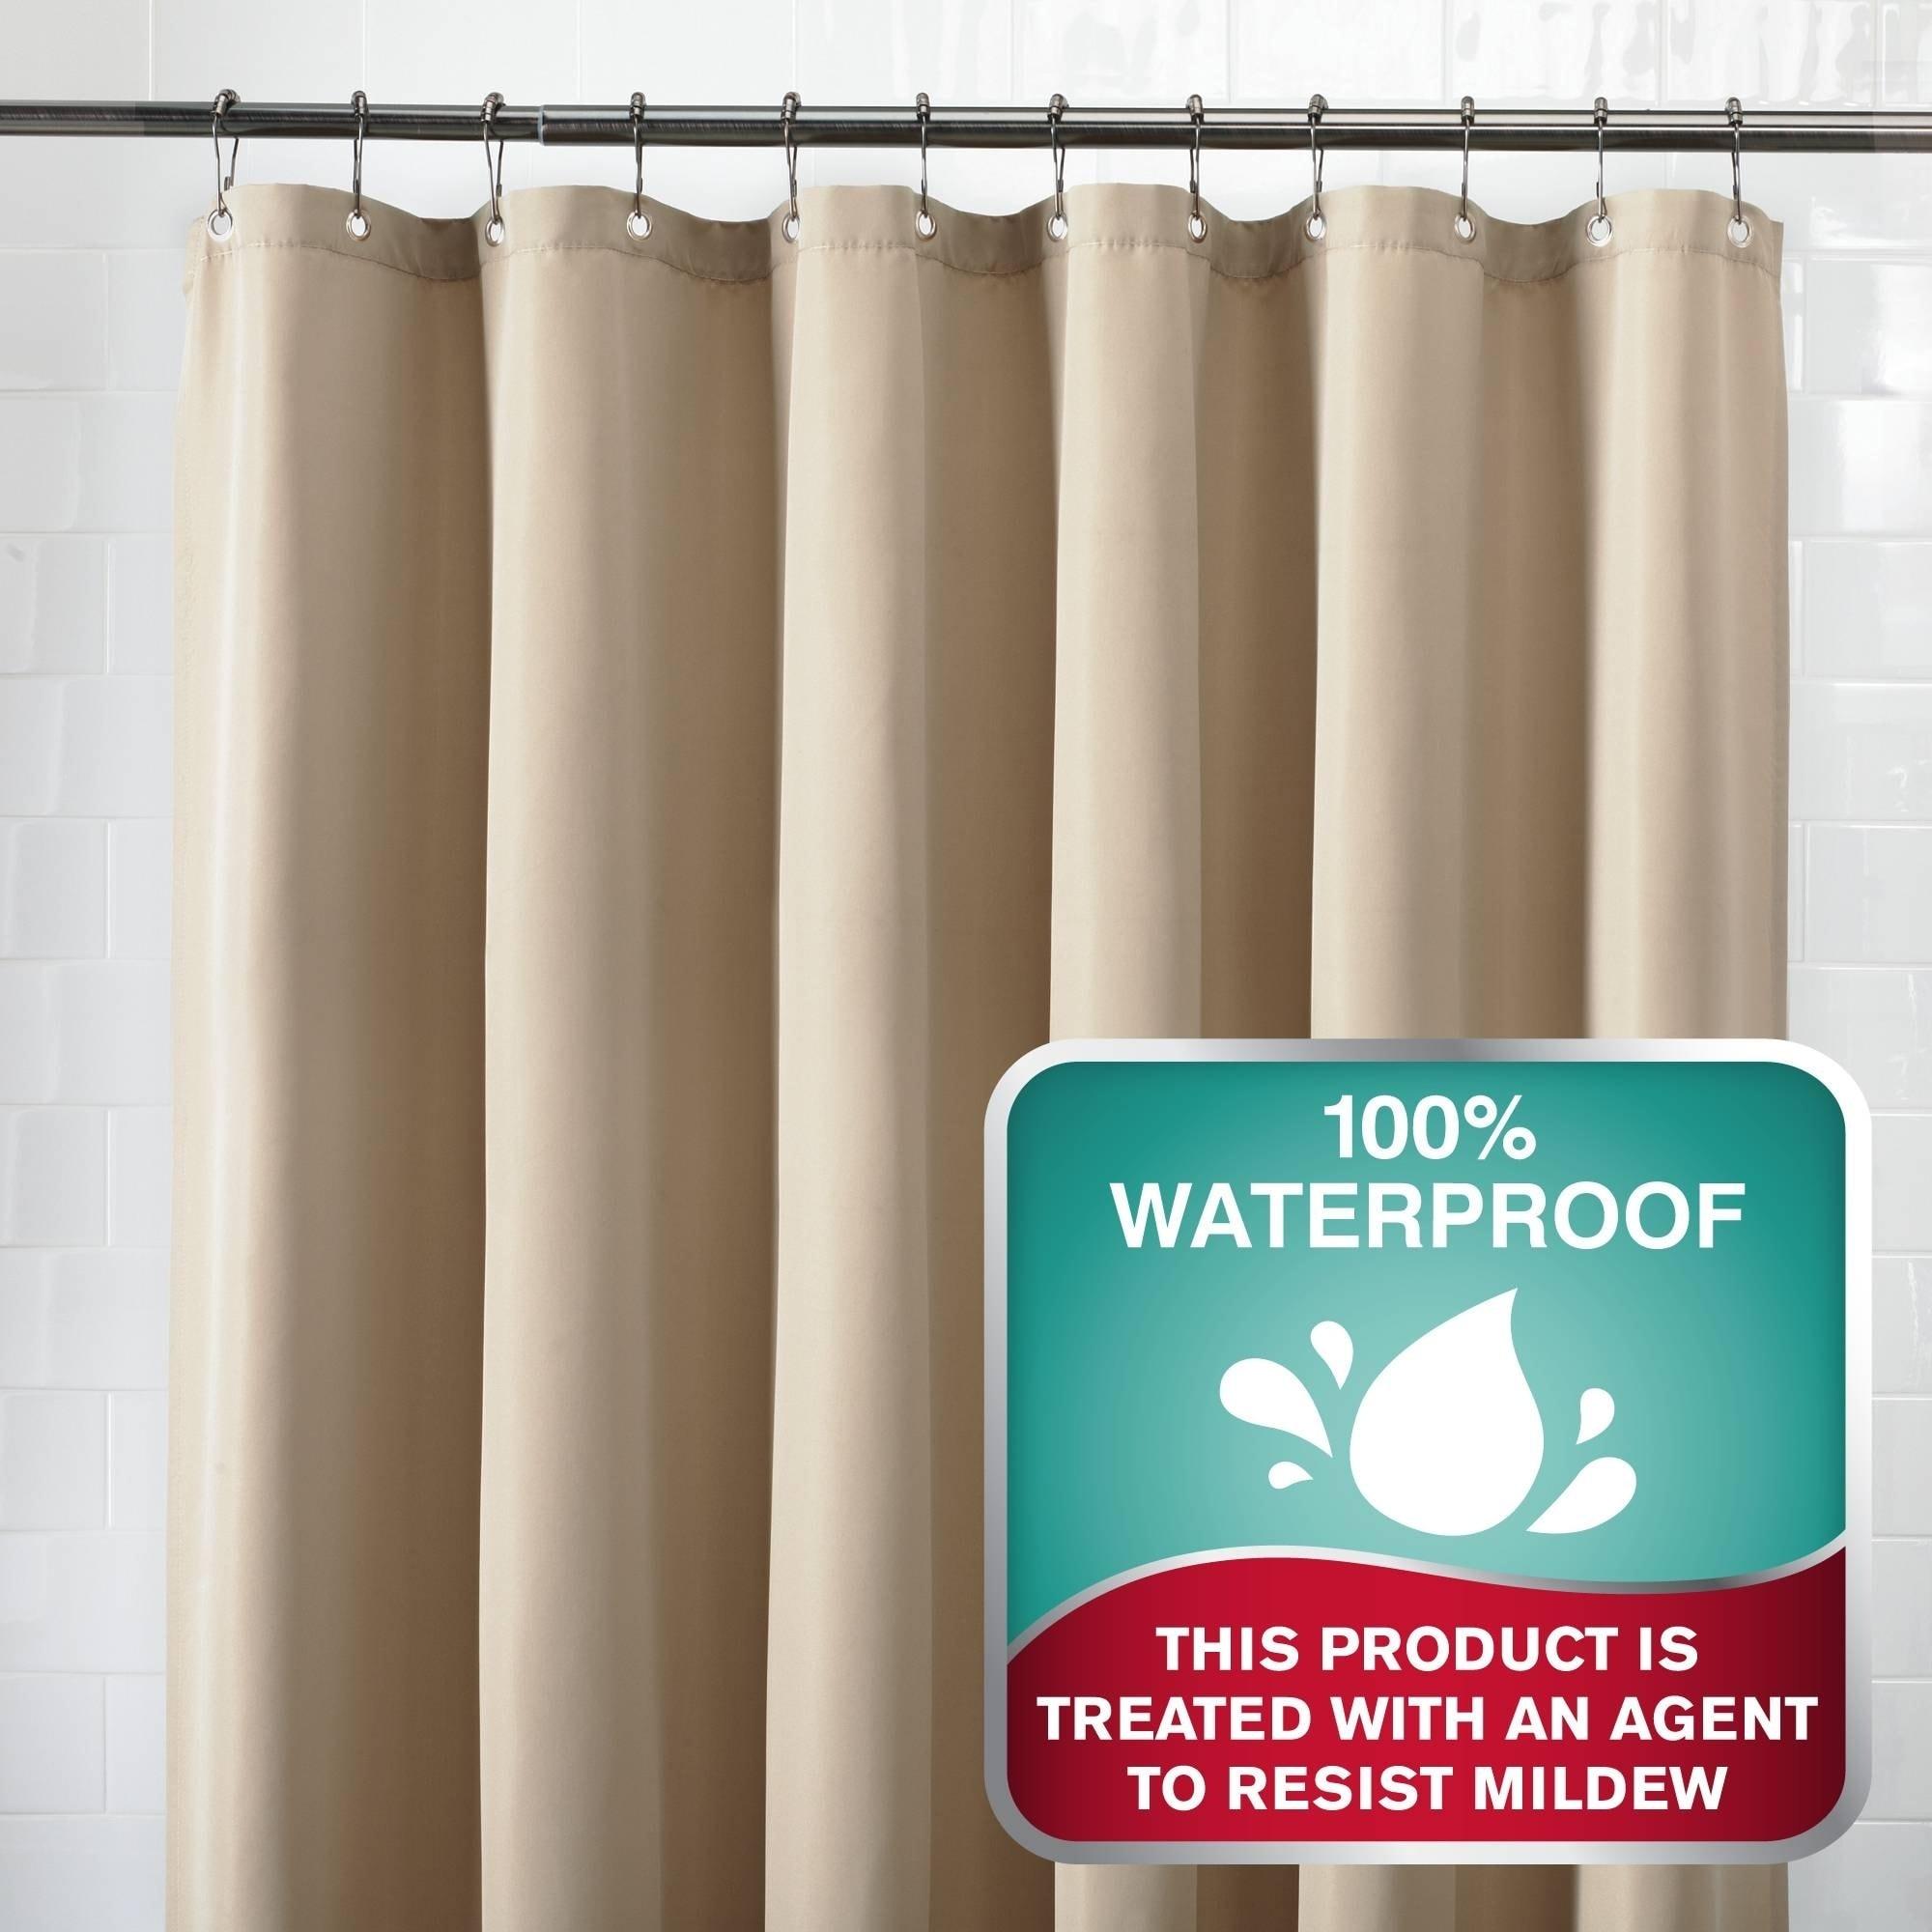 Shop Maytex Waterproof Fabric Shower Curtain Or Liner